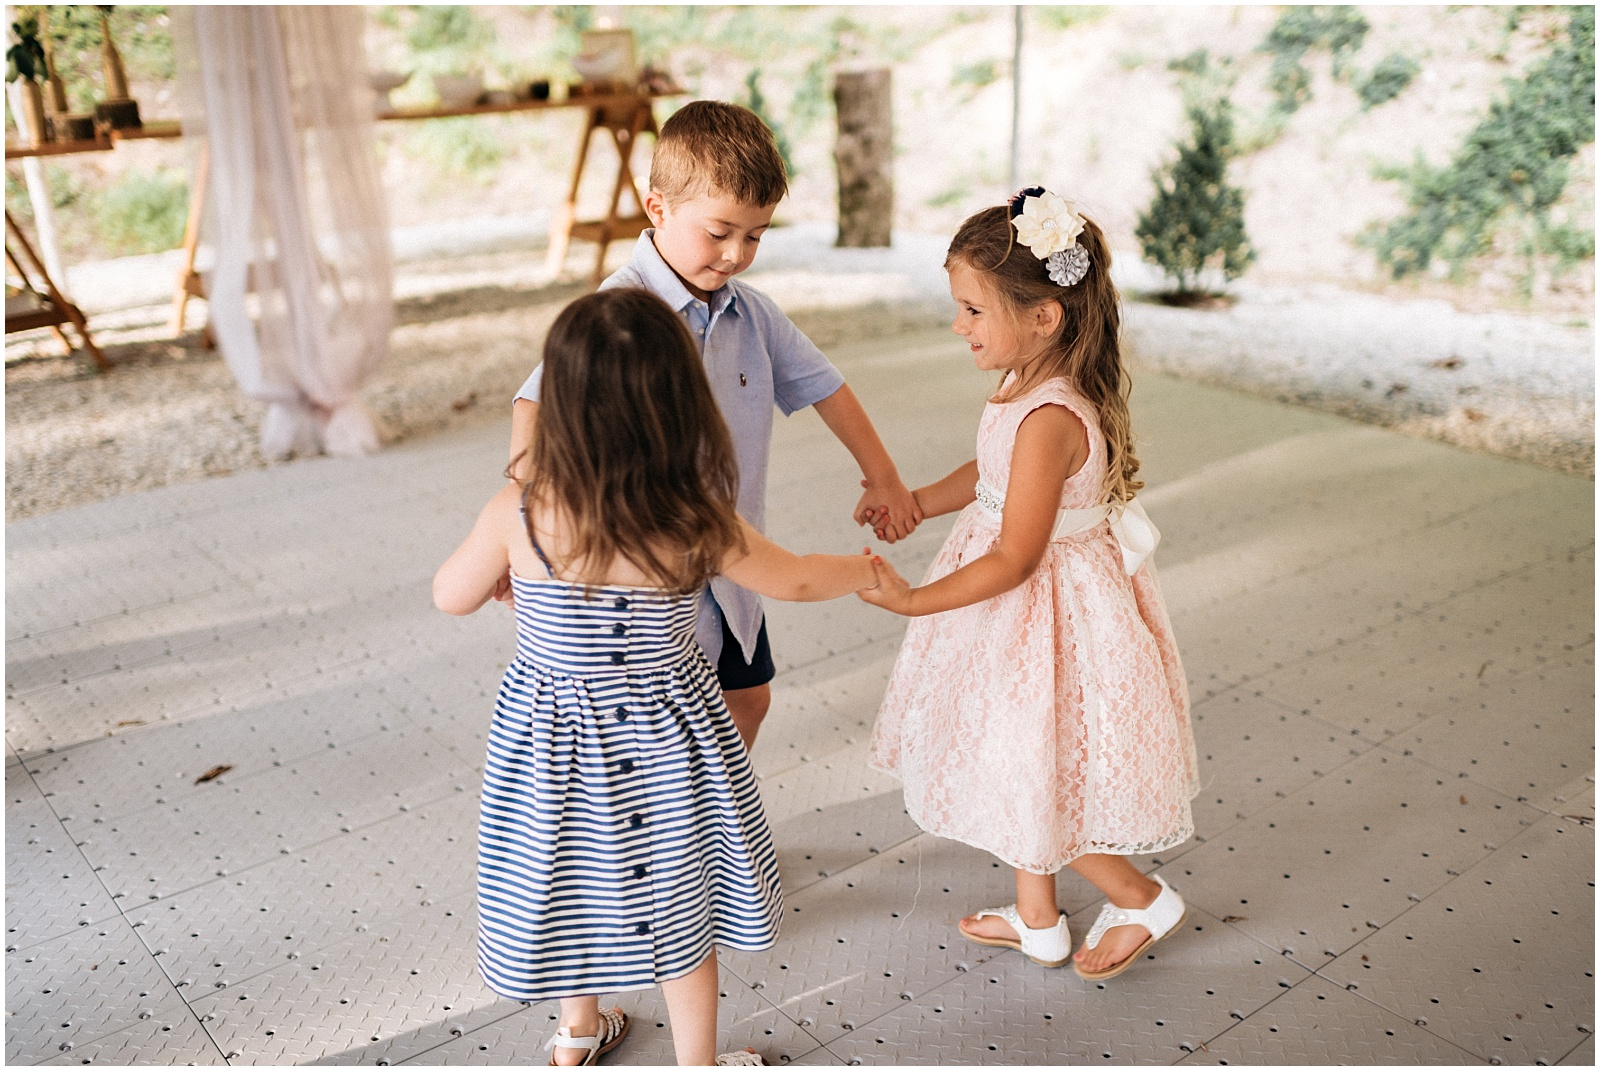 Kids dancing in a circle